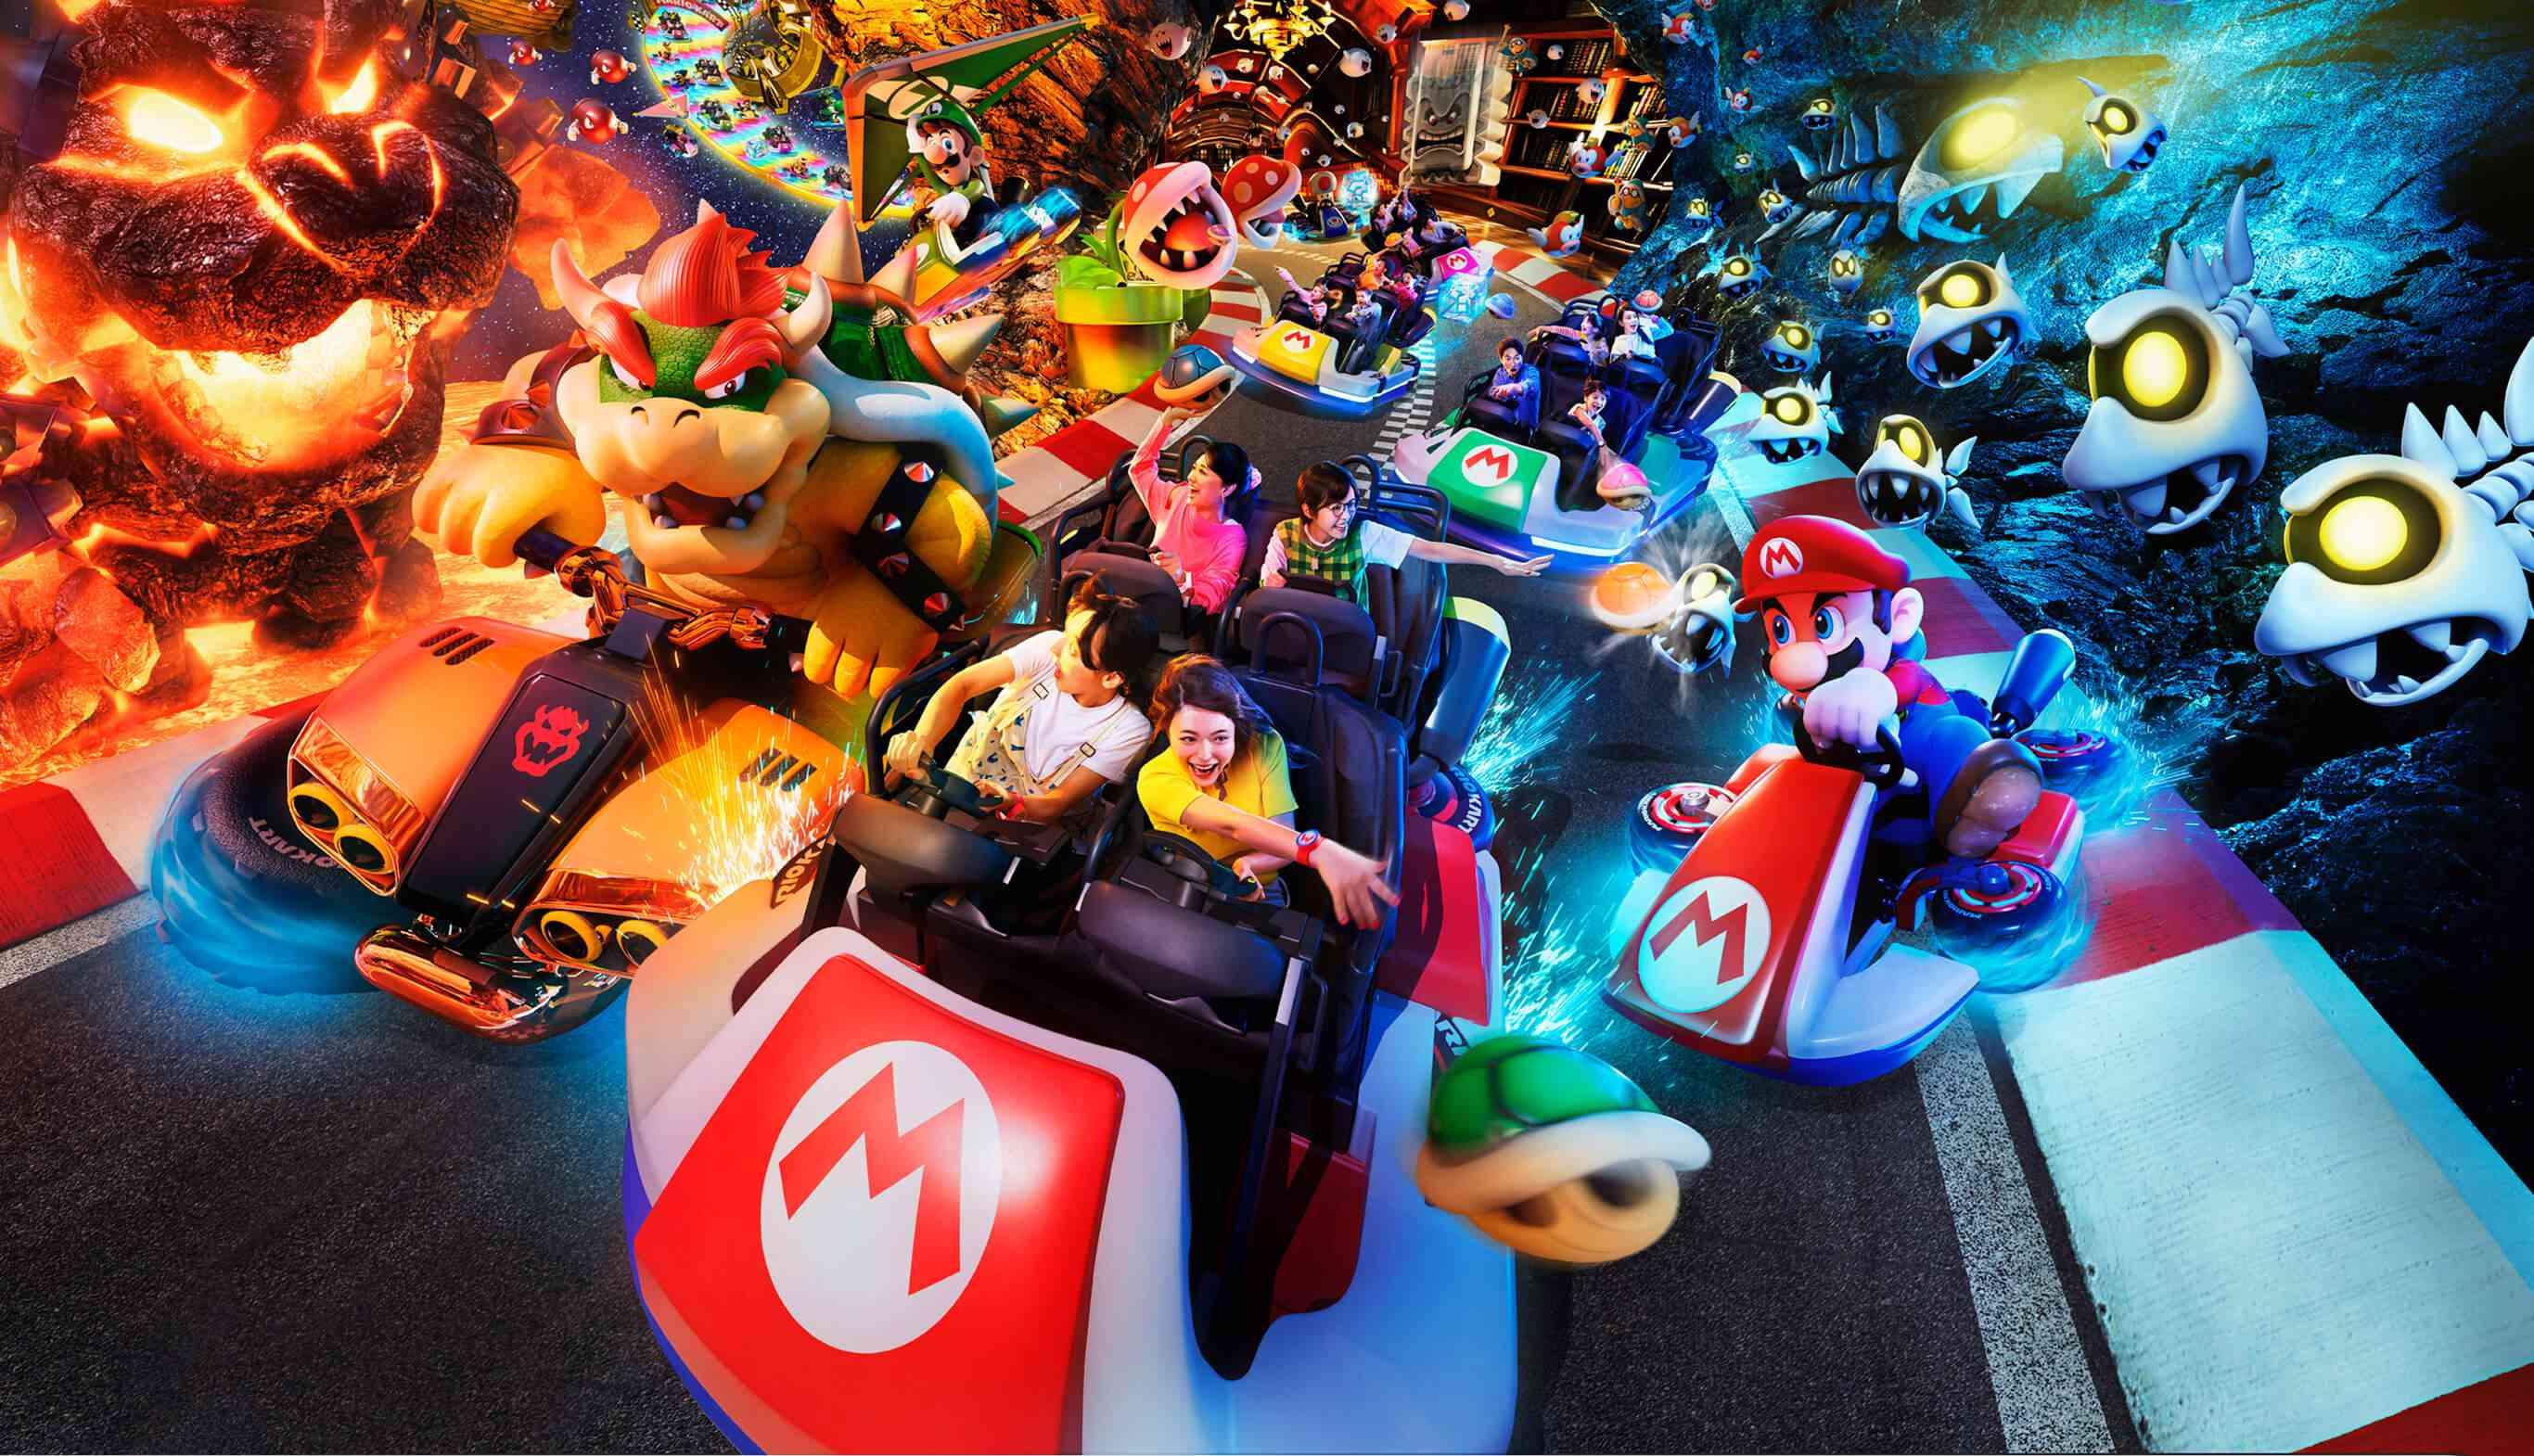 Mario Kart ride at Universal Studios